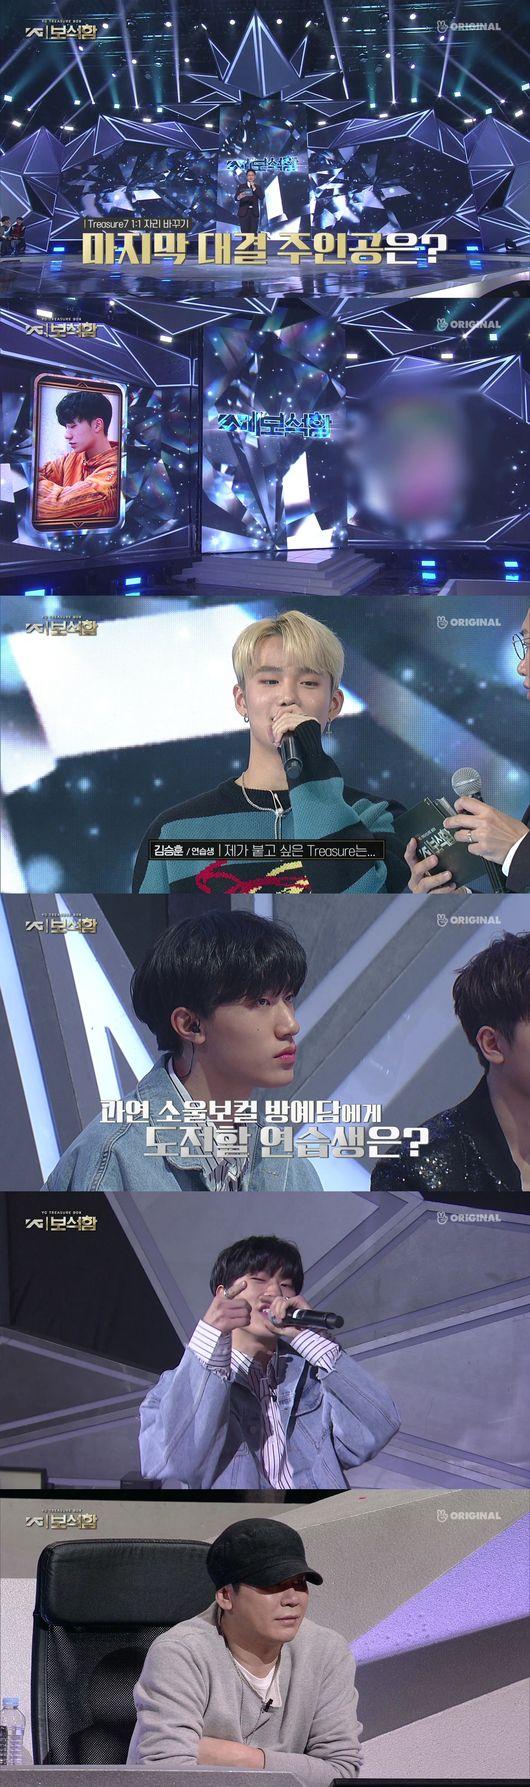 YG보석함, 방예담 자리 뺏을 연습생은? 데뷔 향한 무한 경쟁